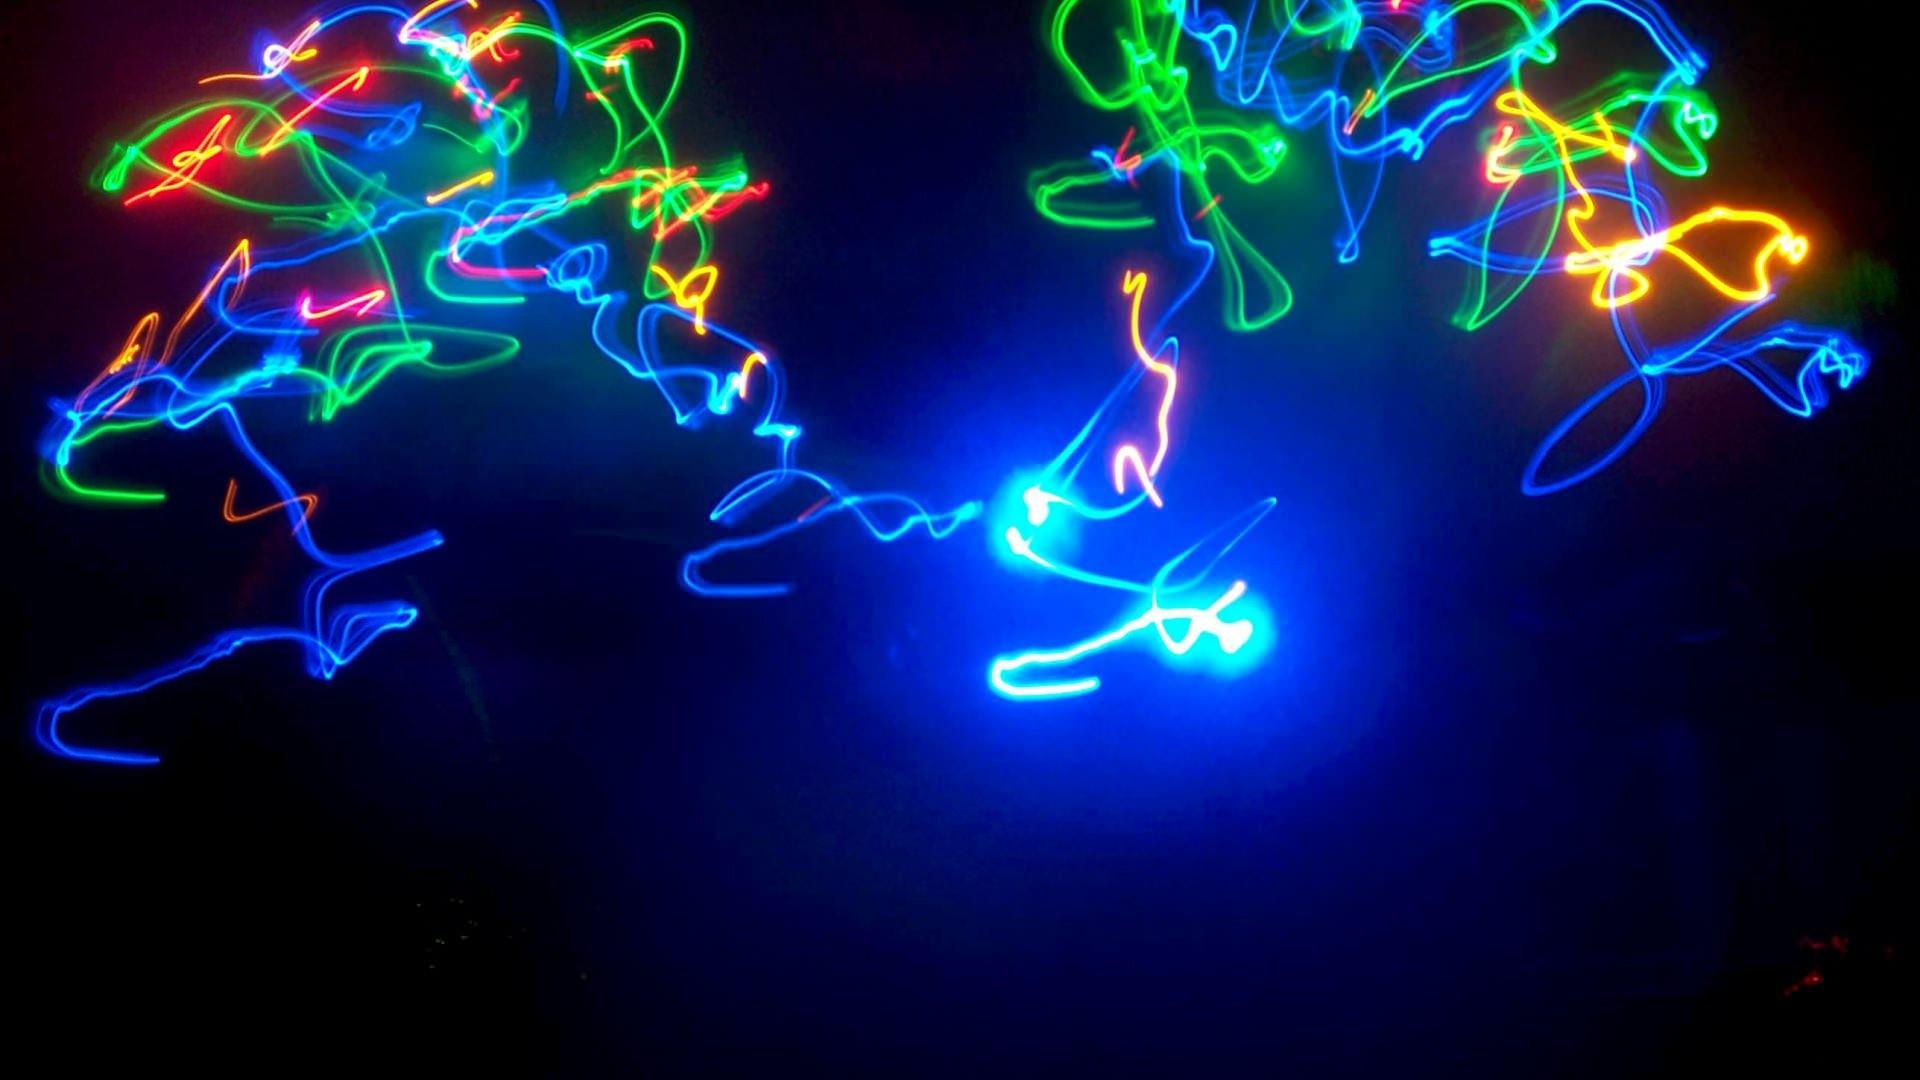 Led Light pics